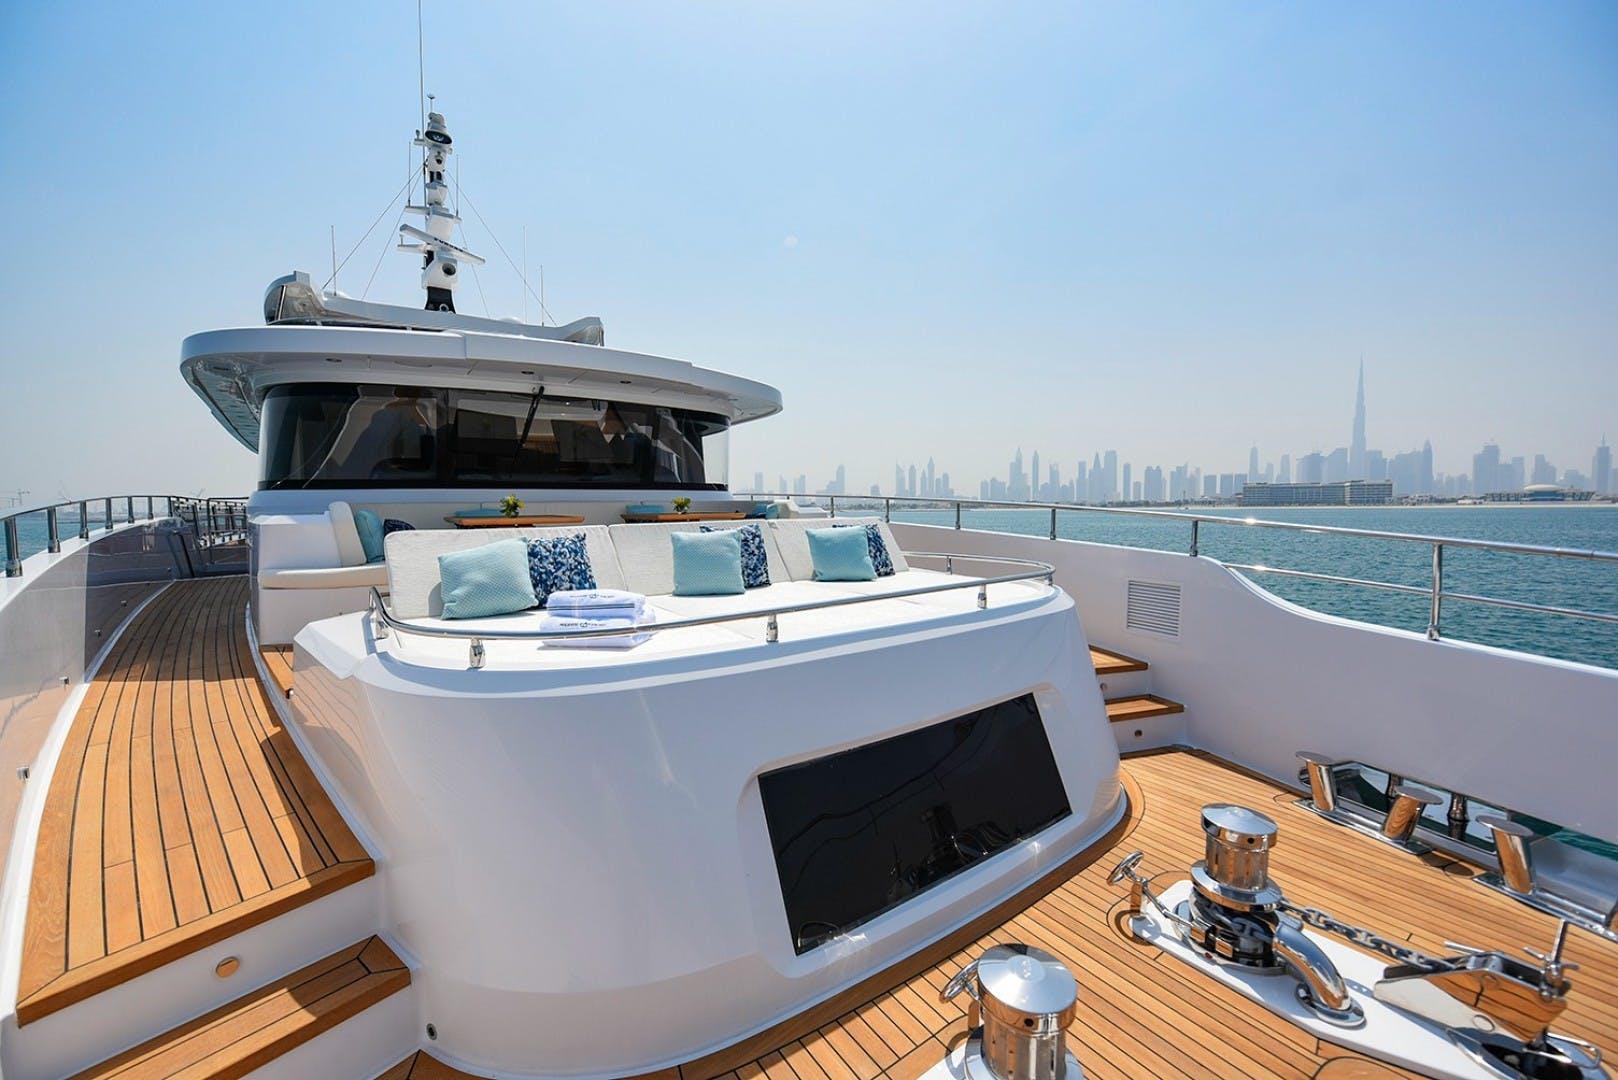 2022 Majesty Yachts 120' Raised Pilothouse MAJESTY 120 | Picture 5 of 39